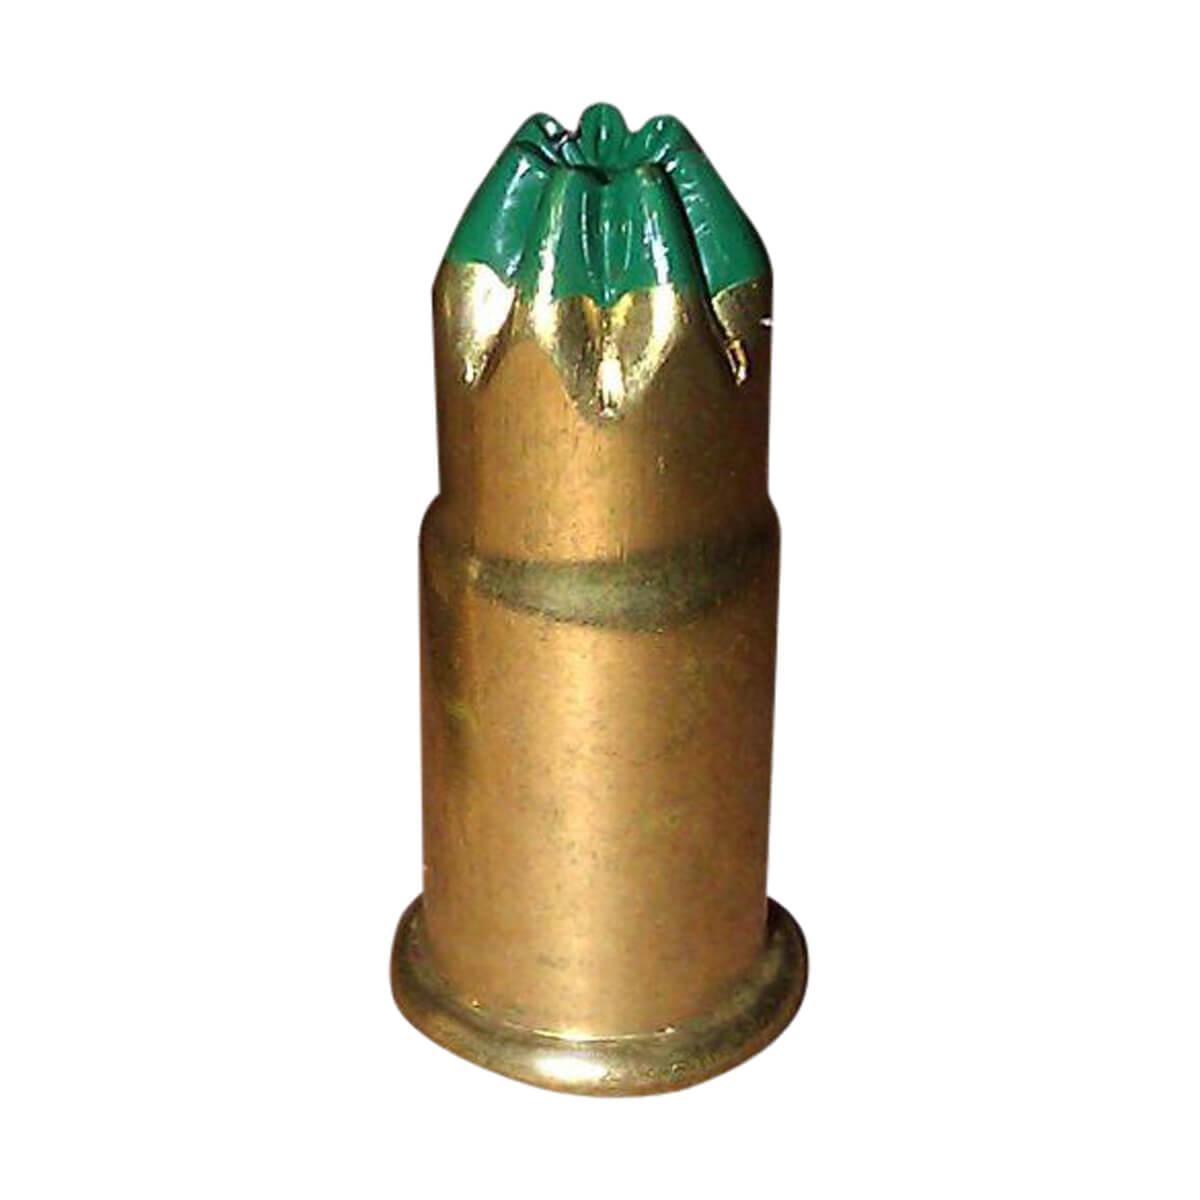 .22 Cal GREEN Load - 25 pack